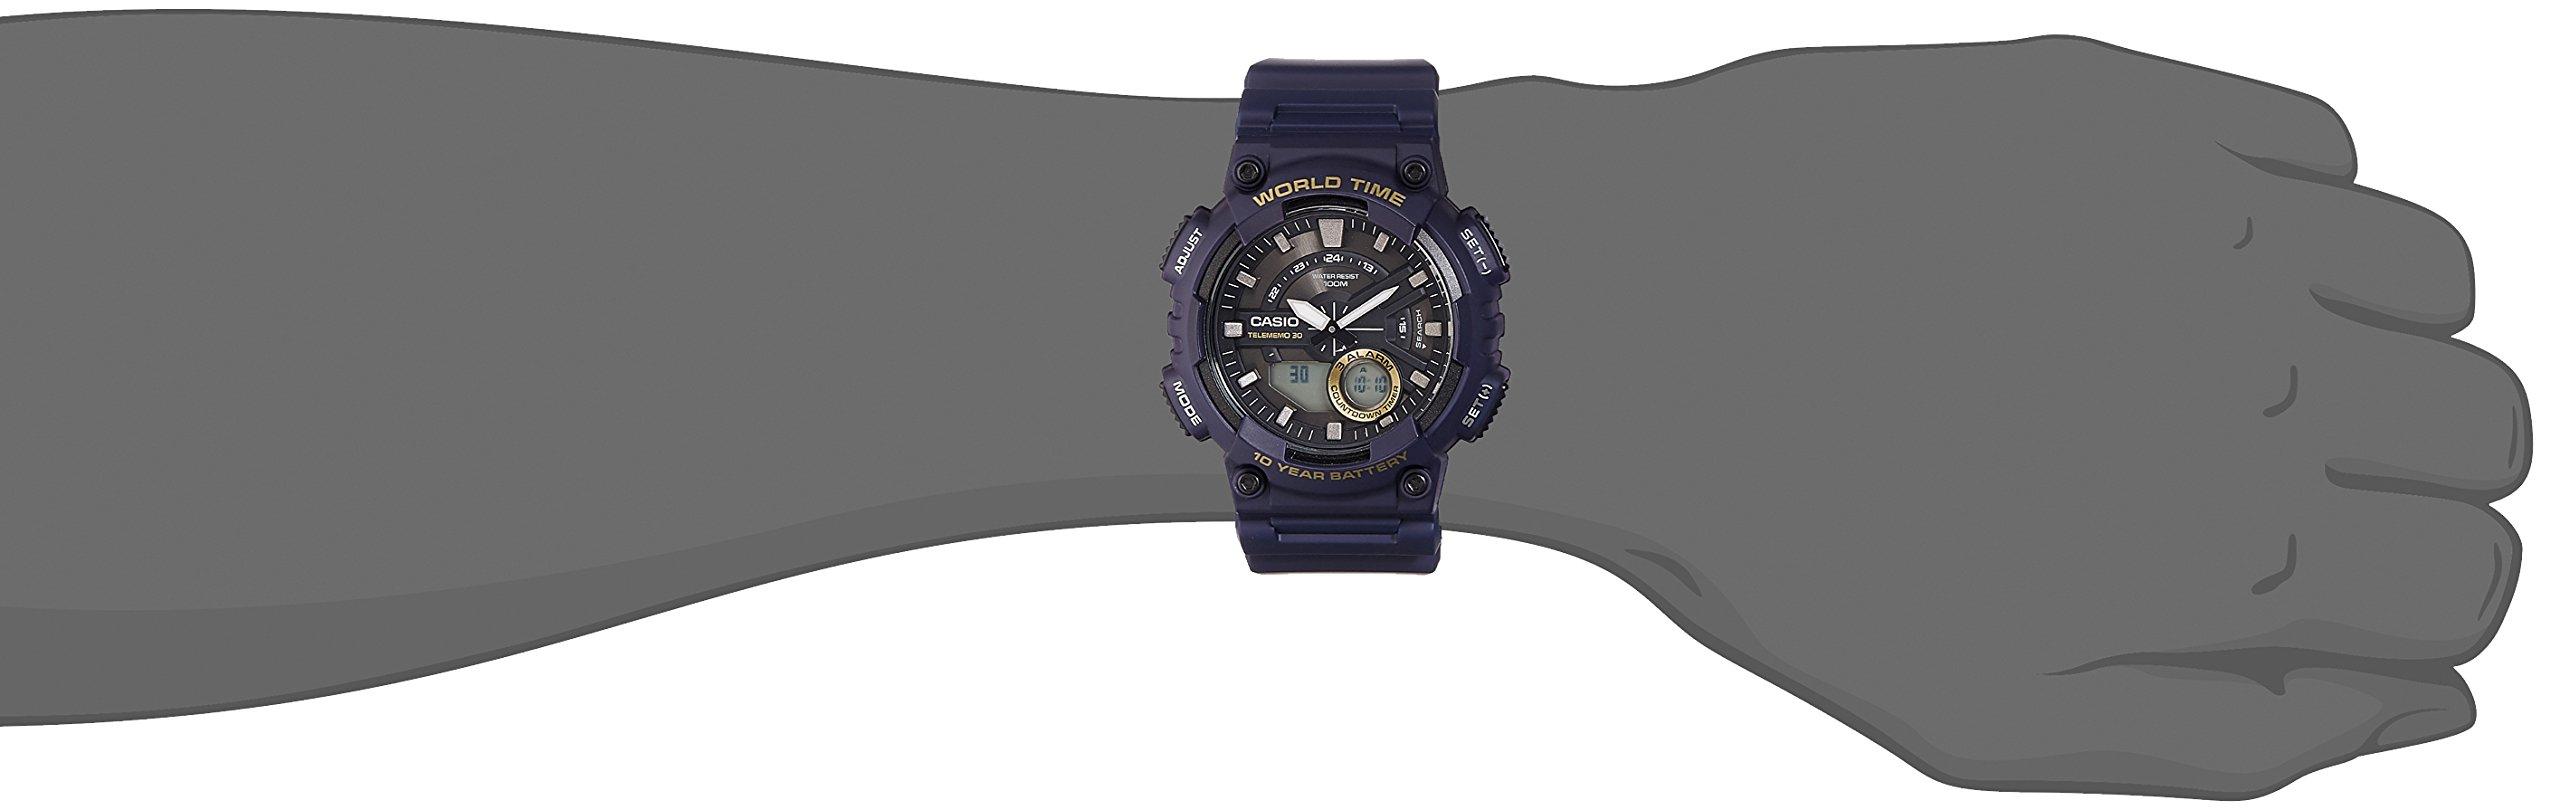 Casio Youth-Combination Analog-Digital Black Dial Men's Watch – AEQ-110W-2AVDF (AD208)